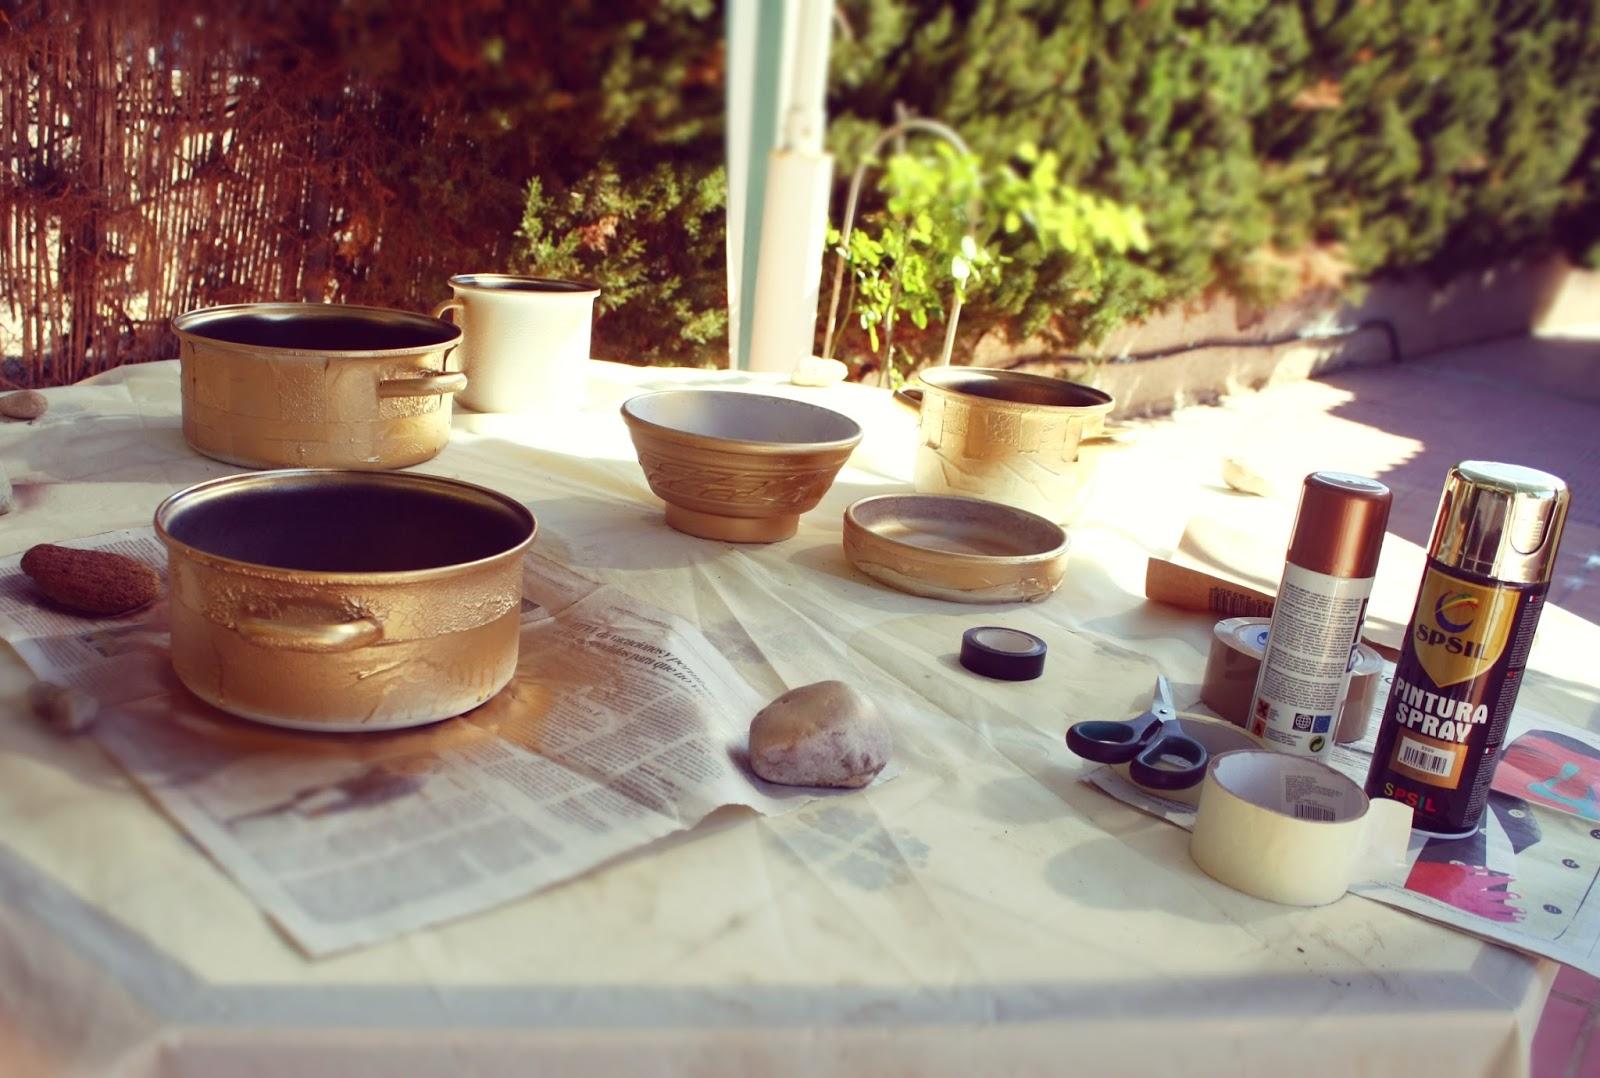 Ollas después de pintar con pintura dorada